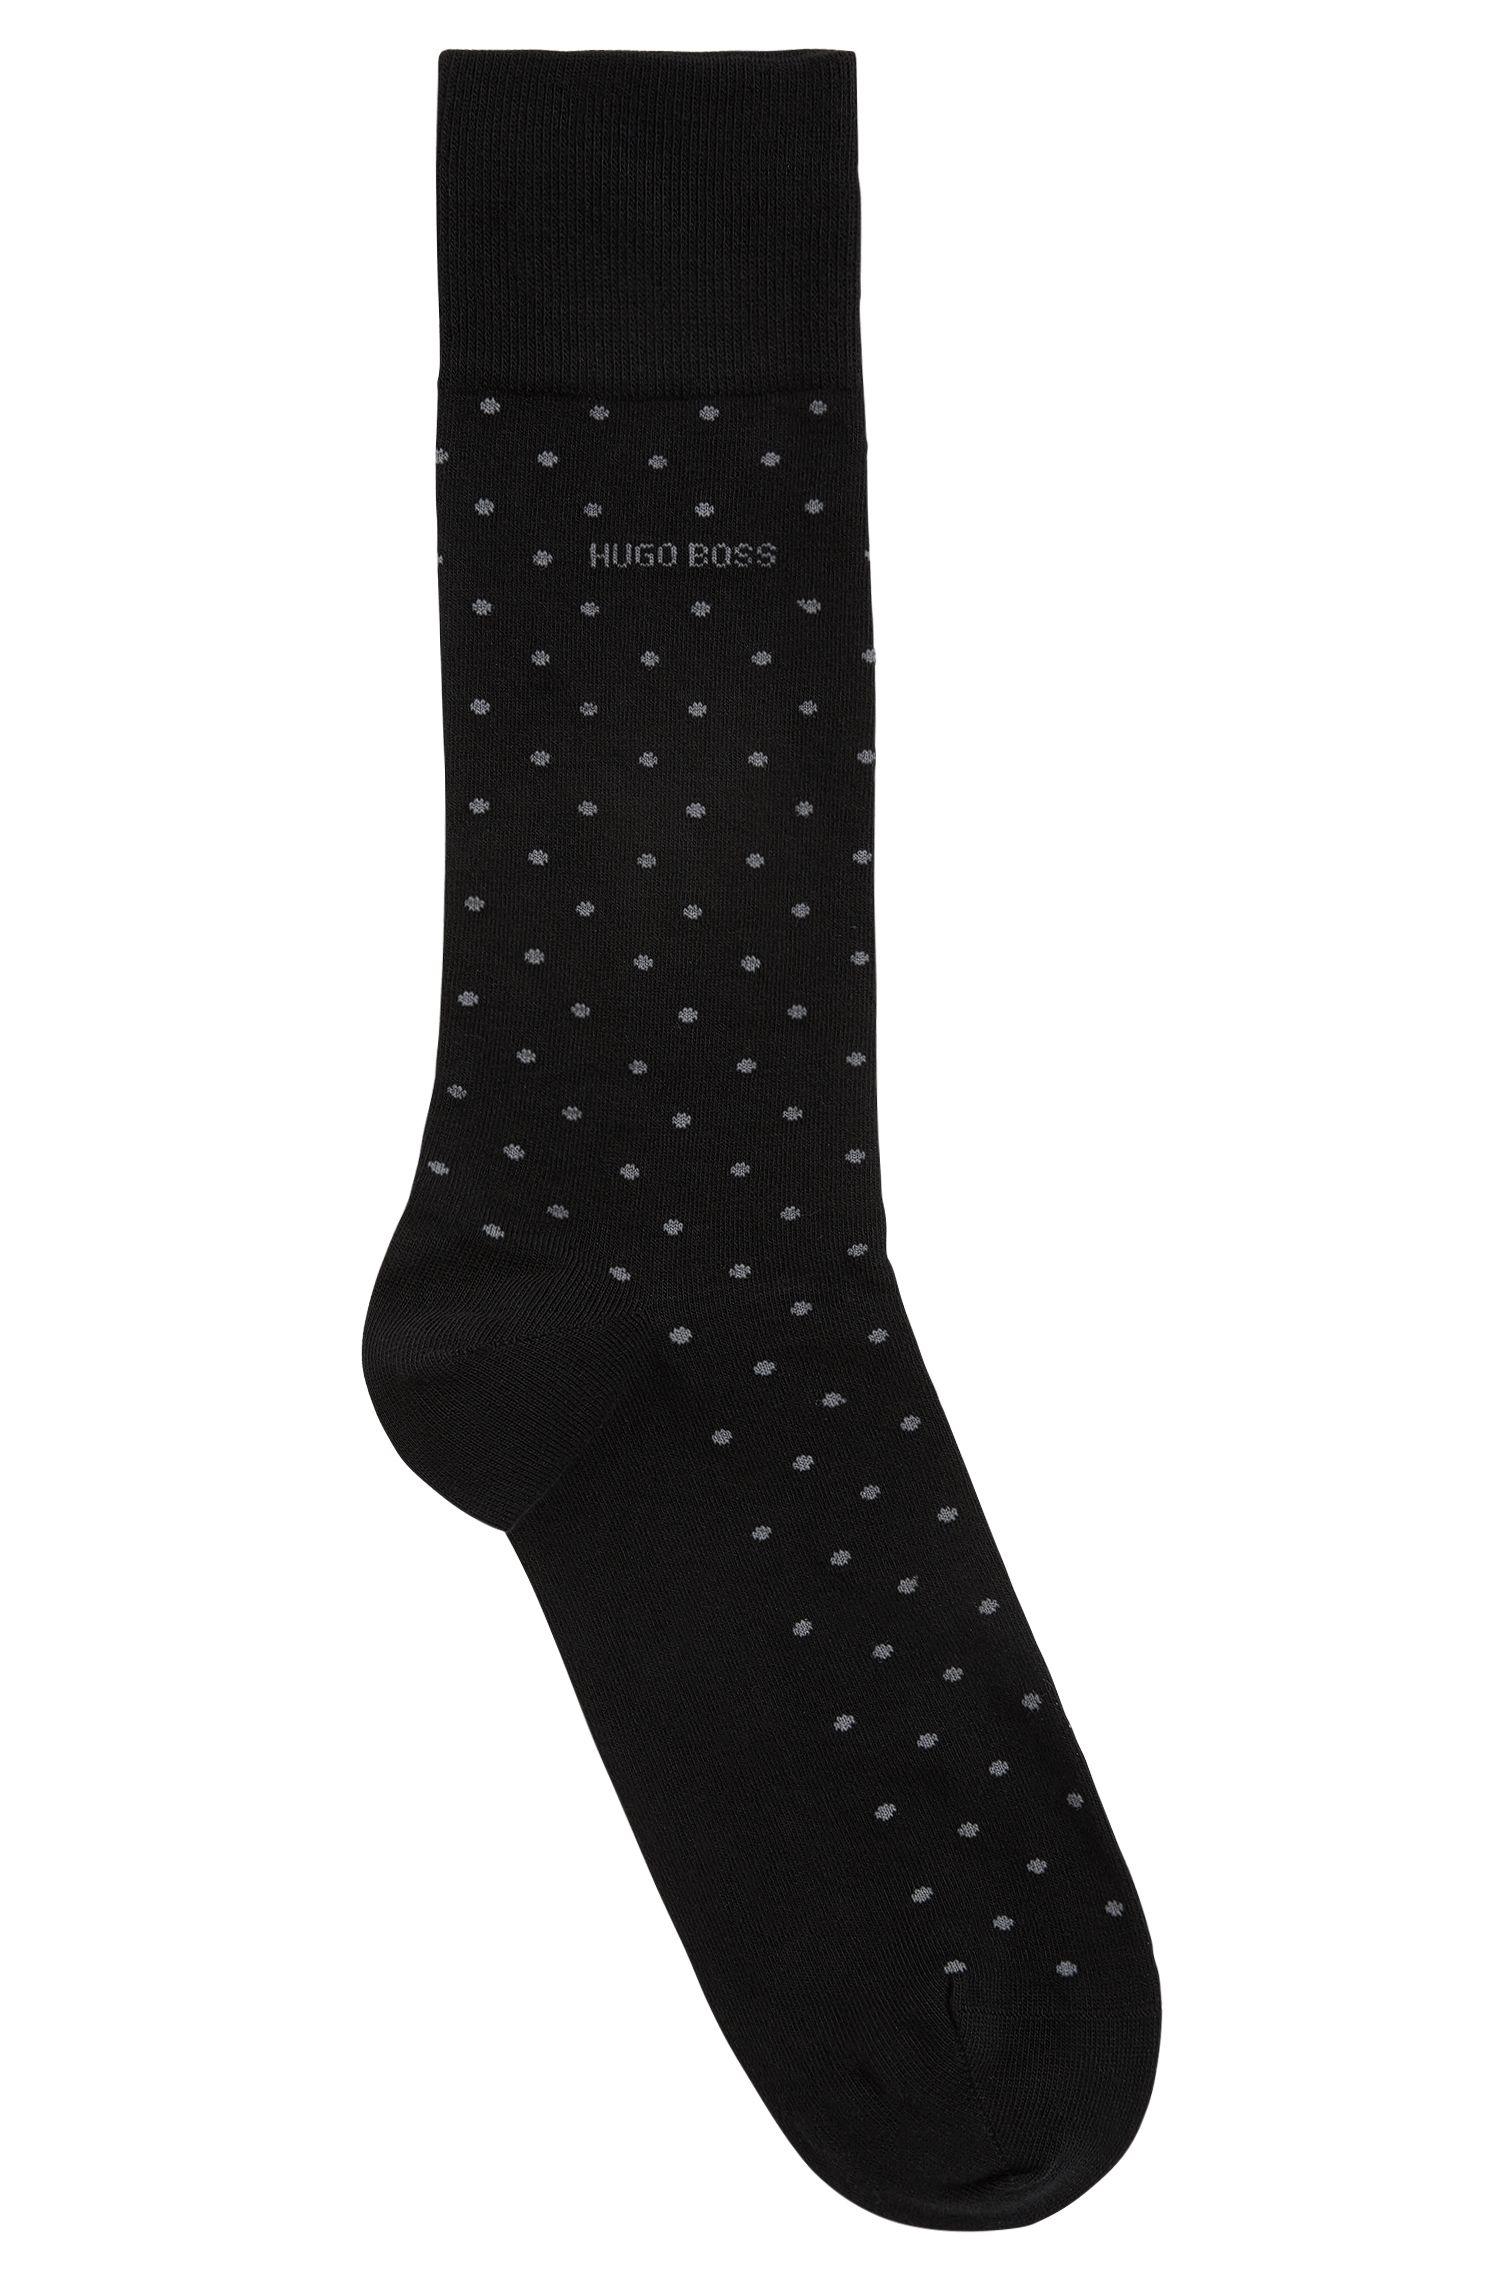 Dotted Stretch Cotton Socks | RS Dot US CC, Black